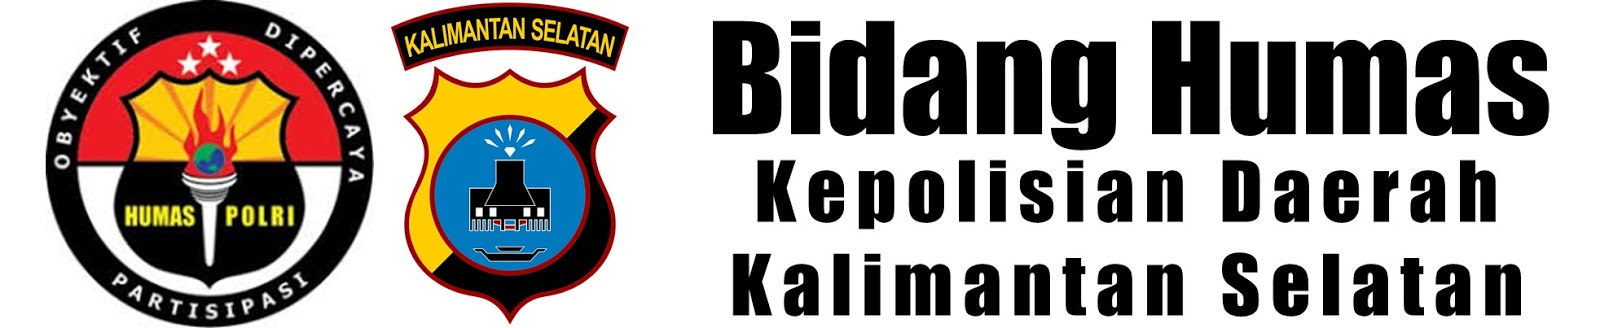 BIDANG HUMAS POLDA KALSEL